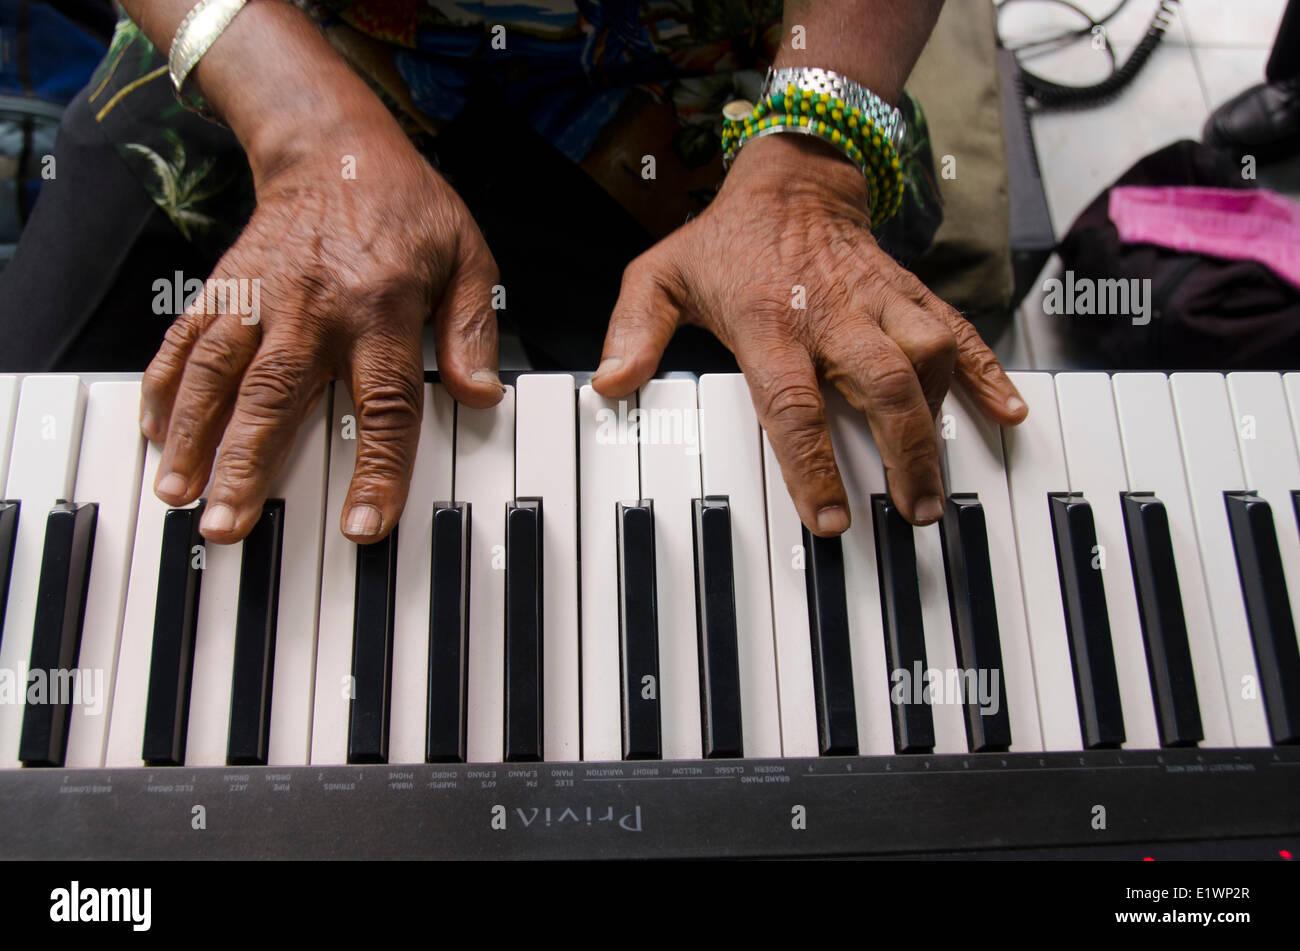 Hands and piano keyboard, Havana, Cuba - Stock Image